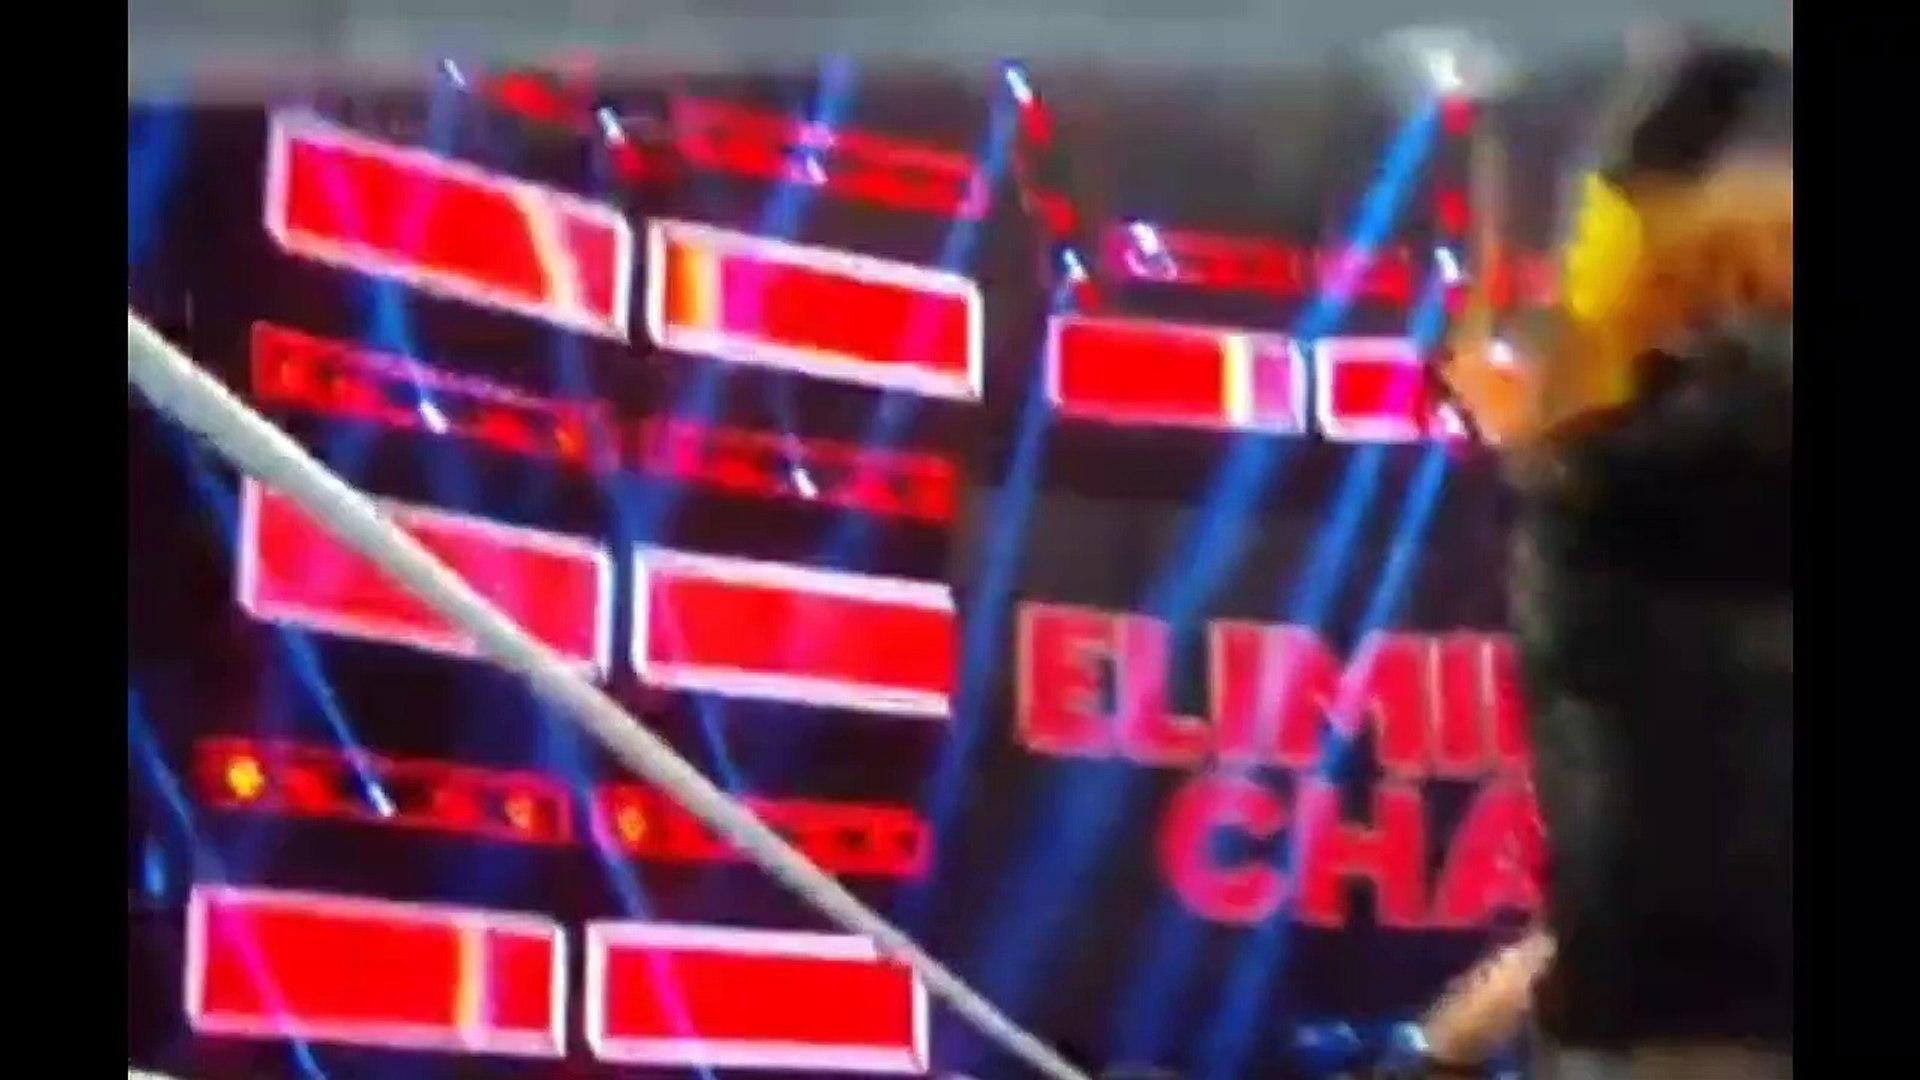 Becky Lynch Brutally Assaults Ronda & Charlotte - WWE Elimination Chamber 2019 Highlights